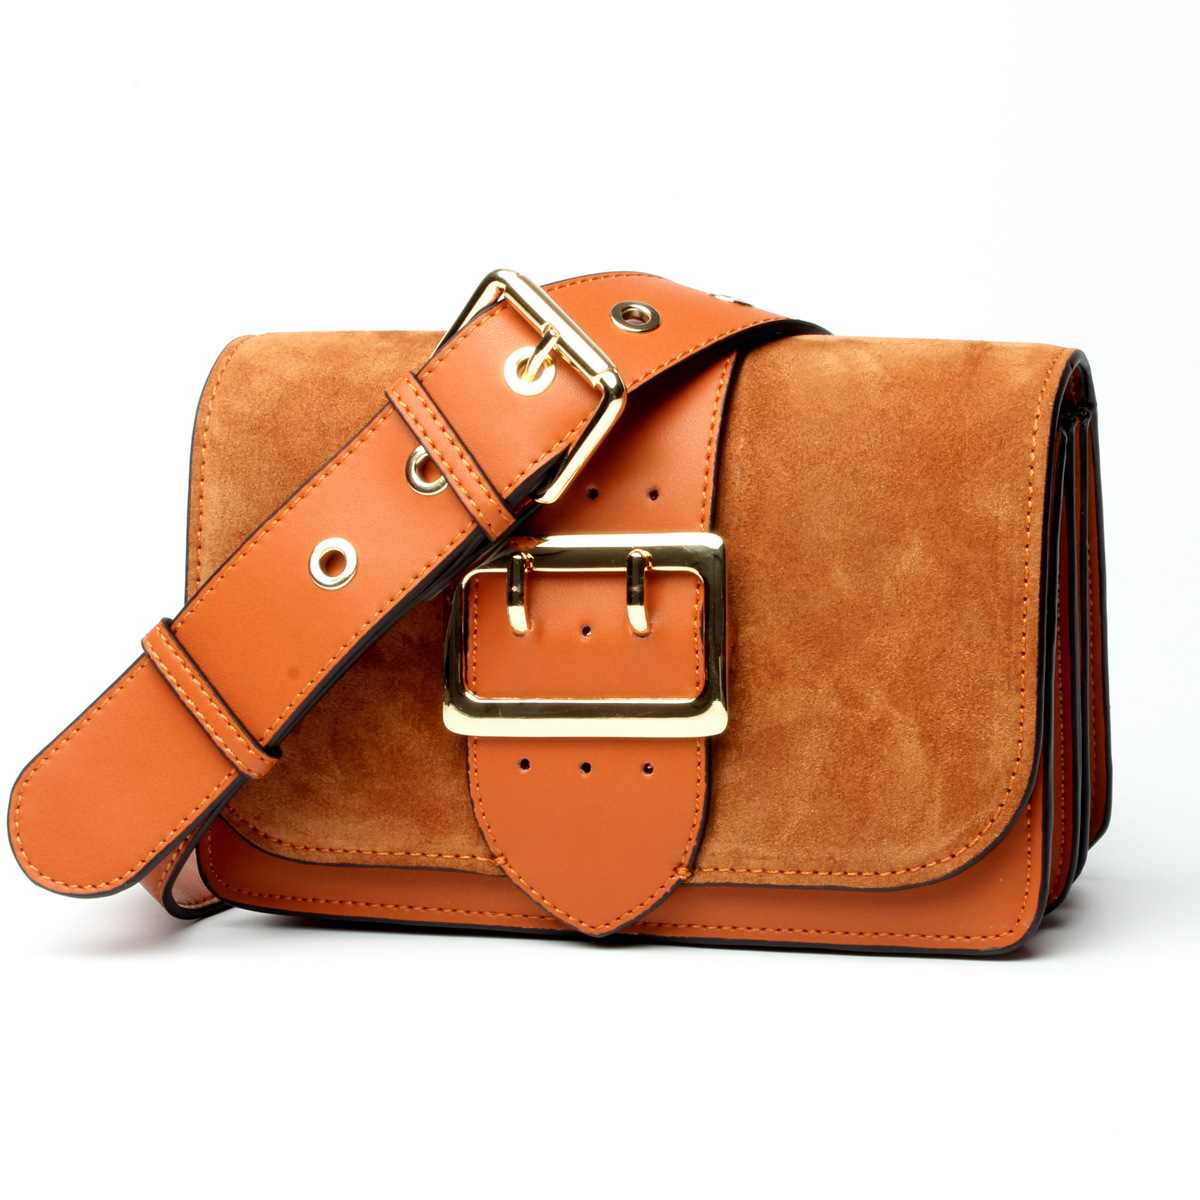 ФОТО L6132 Wholesale 2017 New Tide Leather handbag fashion Leisure Leather shoulder bag Women oblique crossbody bag